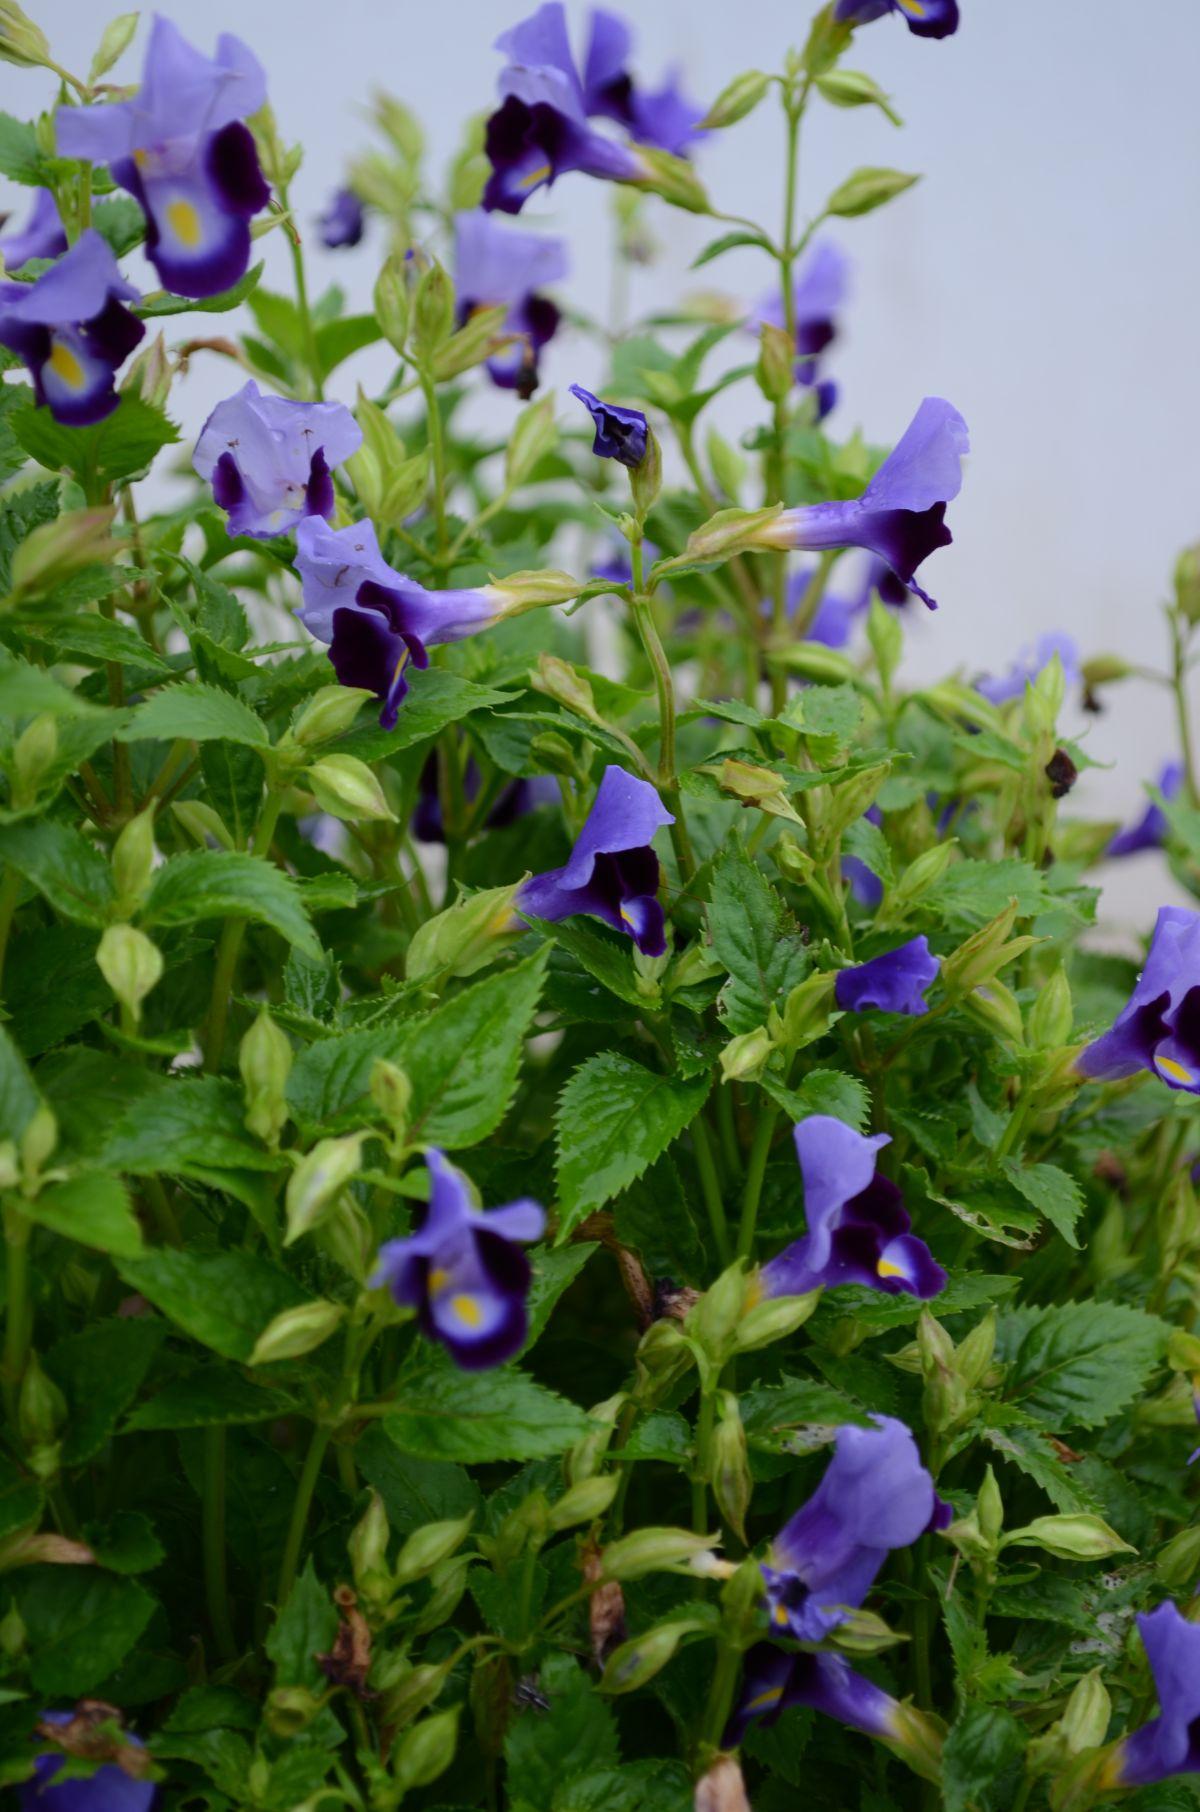 violet torenia flowers